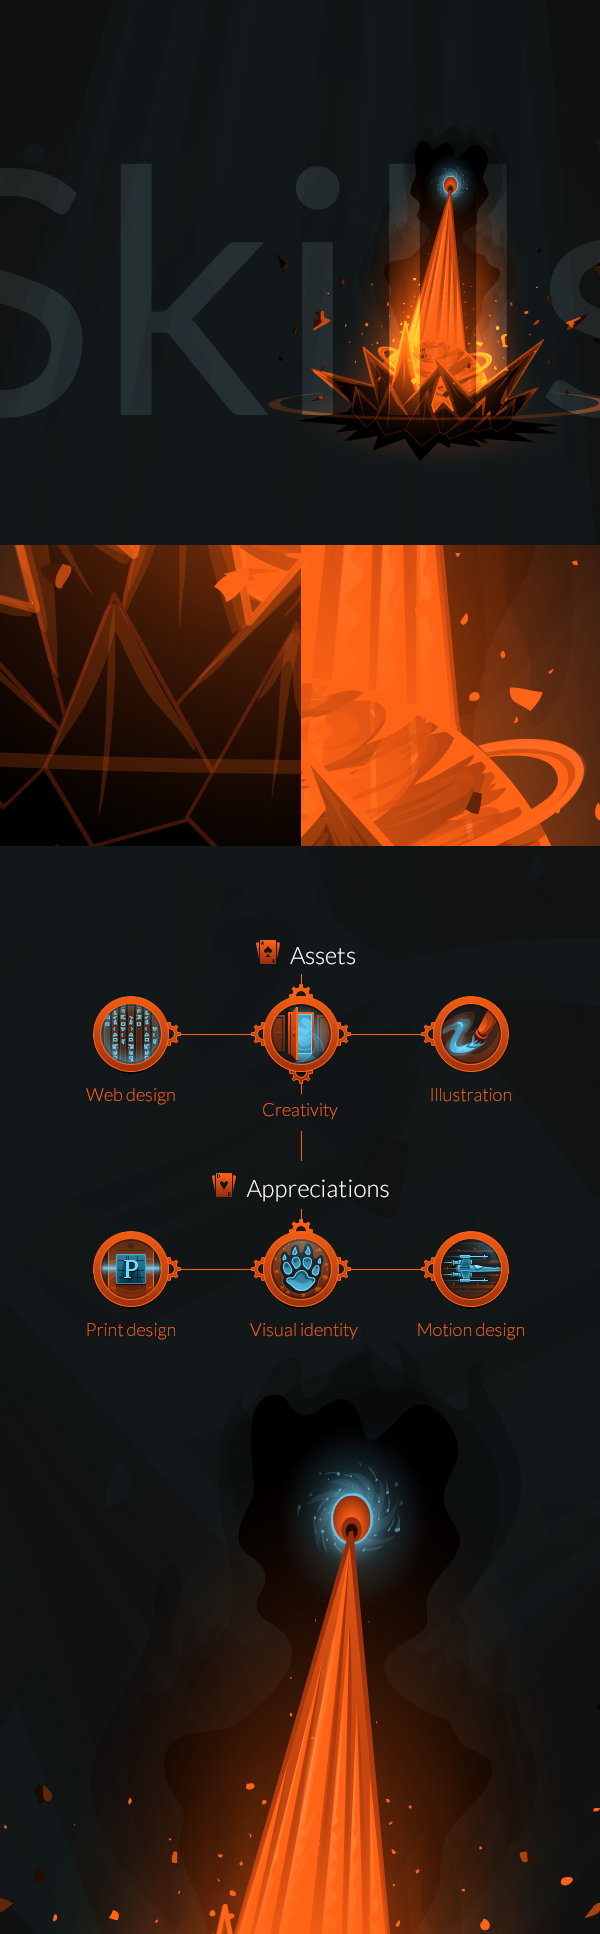 skills portfolio Icon